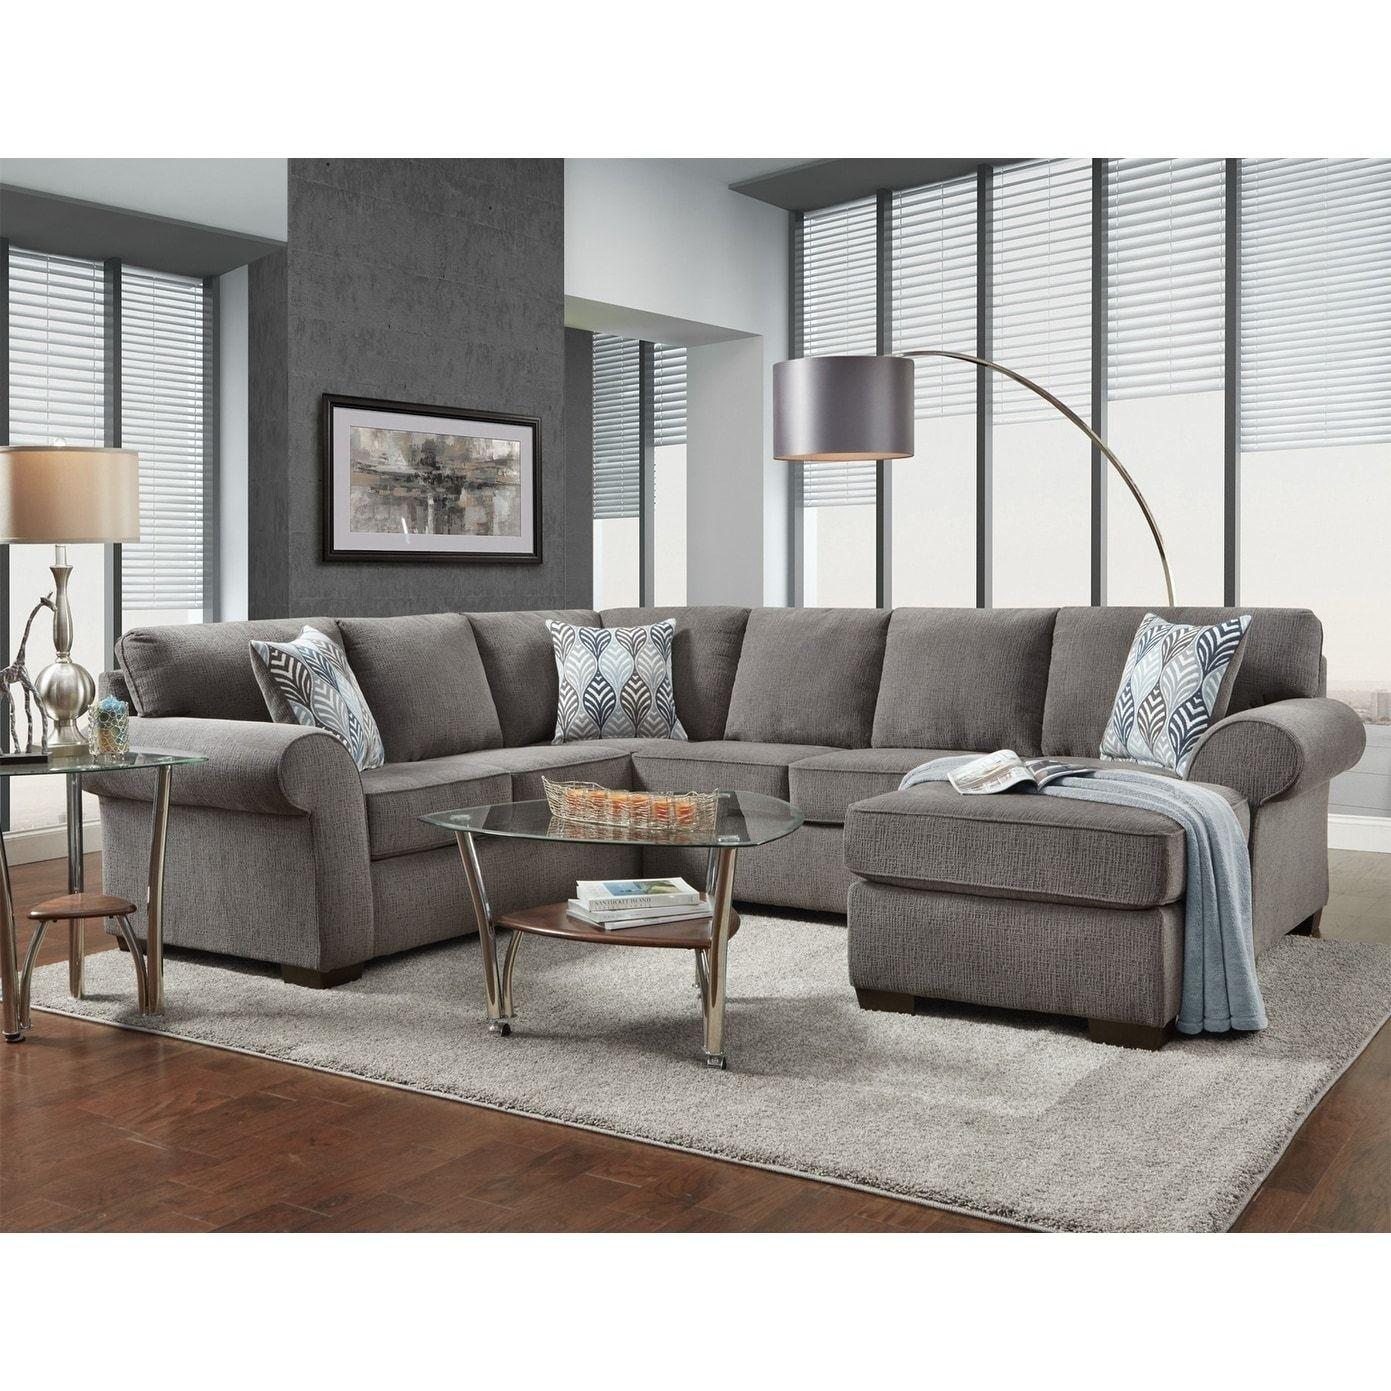 Sofatrendz Marlton Smoke Grey Sectional Living Room Sectional Affordable Furniture Sectional Living Room Sets